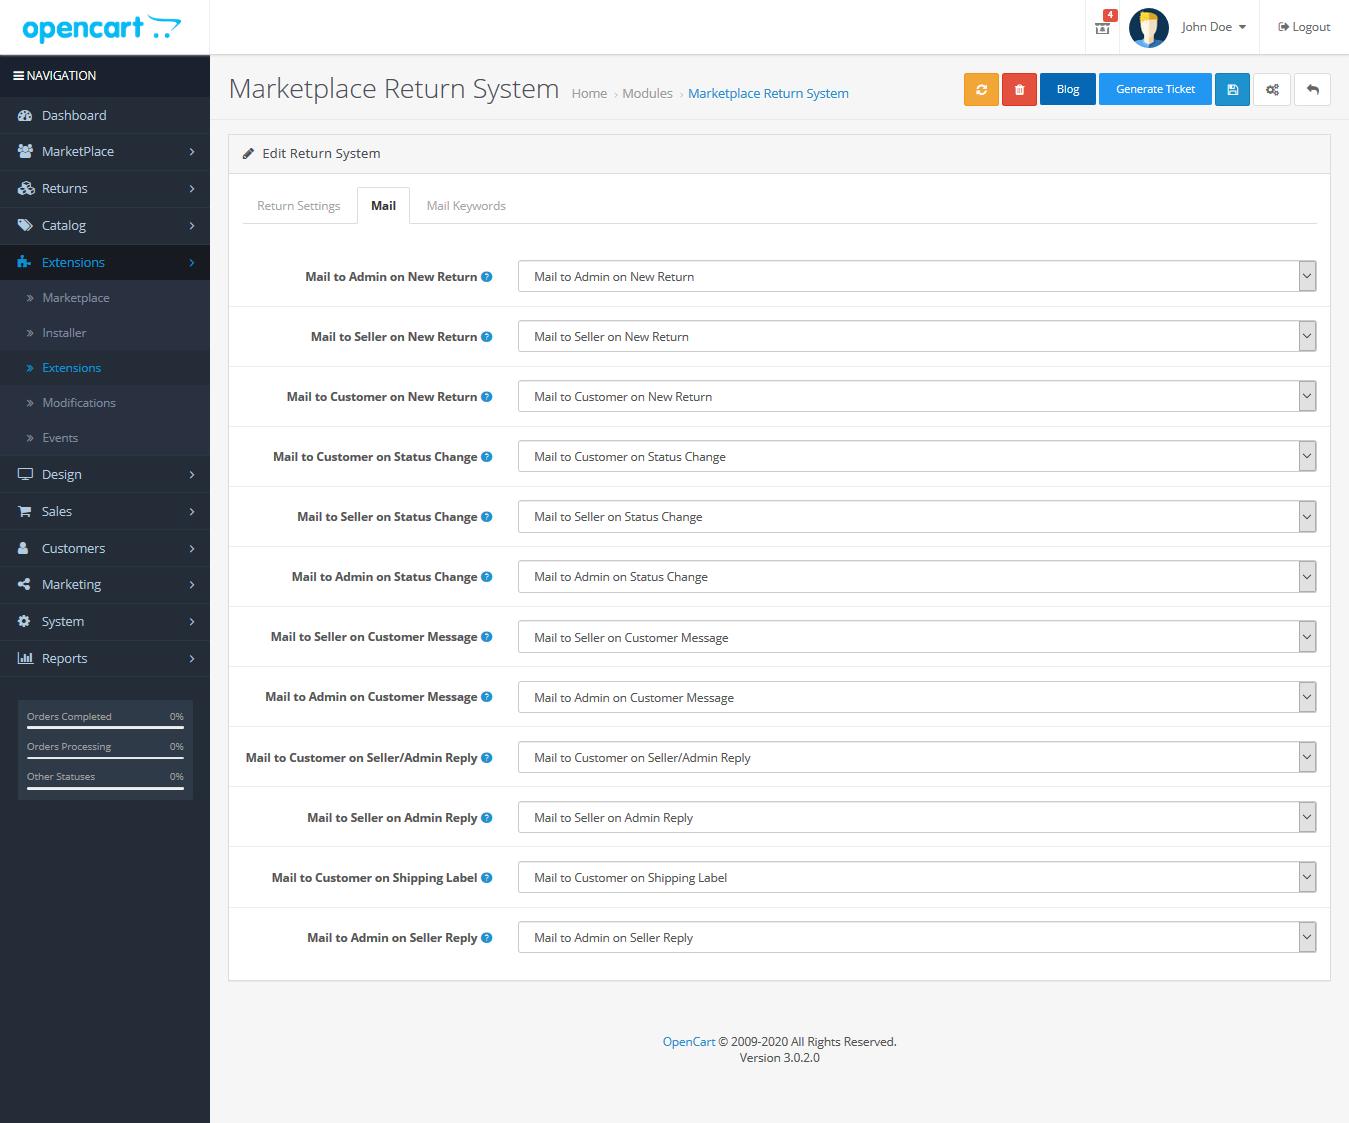 webkul_opencart_marketplace_rma_mail_configuration_settings